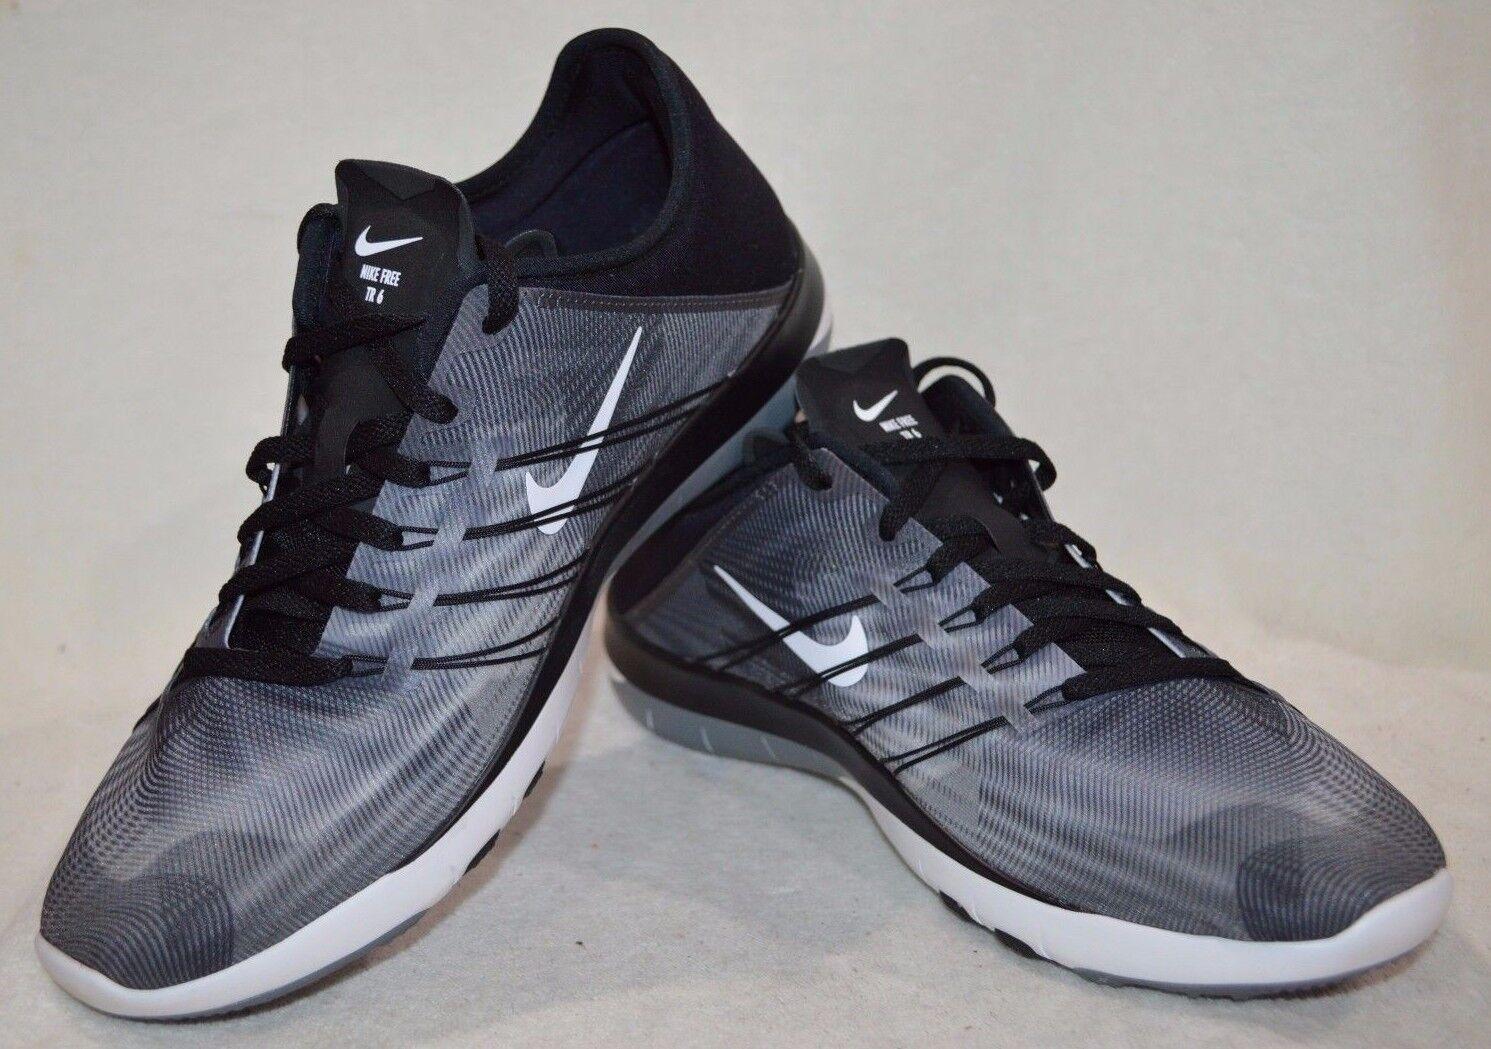 Nike Free TR 6 stampa Nero Bianco Grigio Donna Scarpe da Training-ASST Taglie NWB